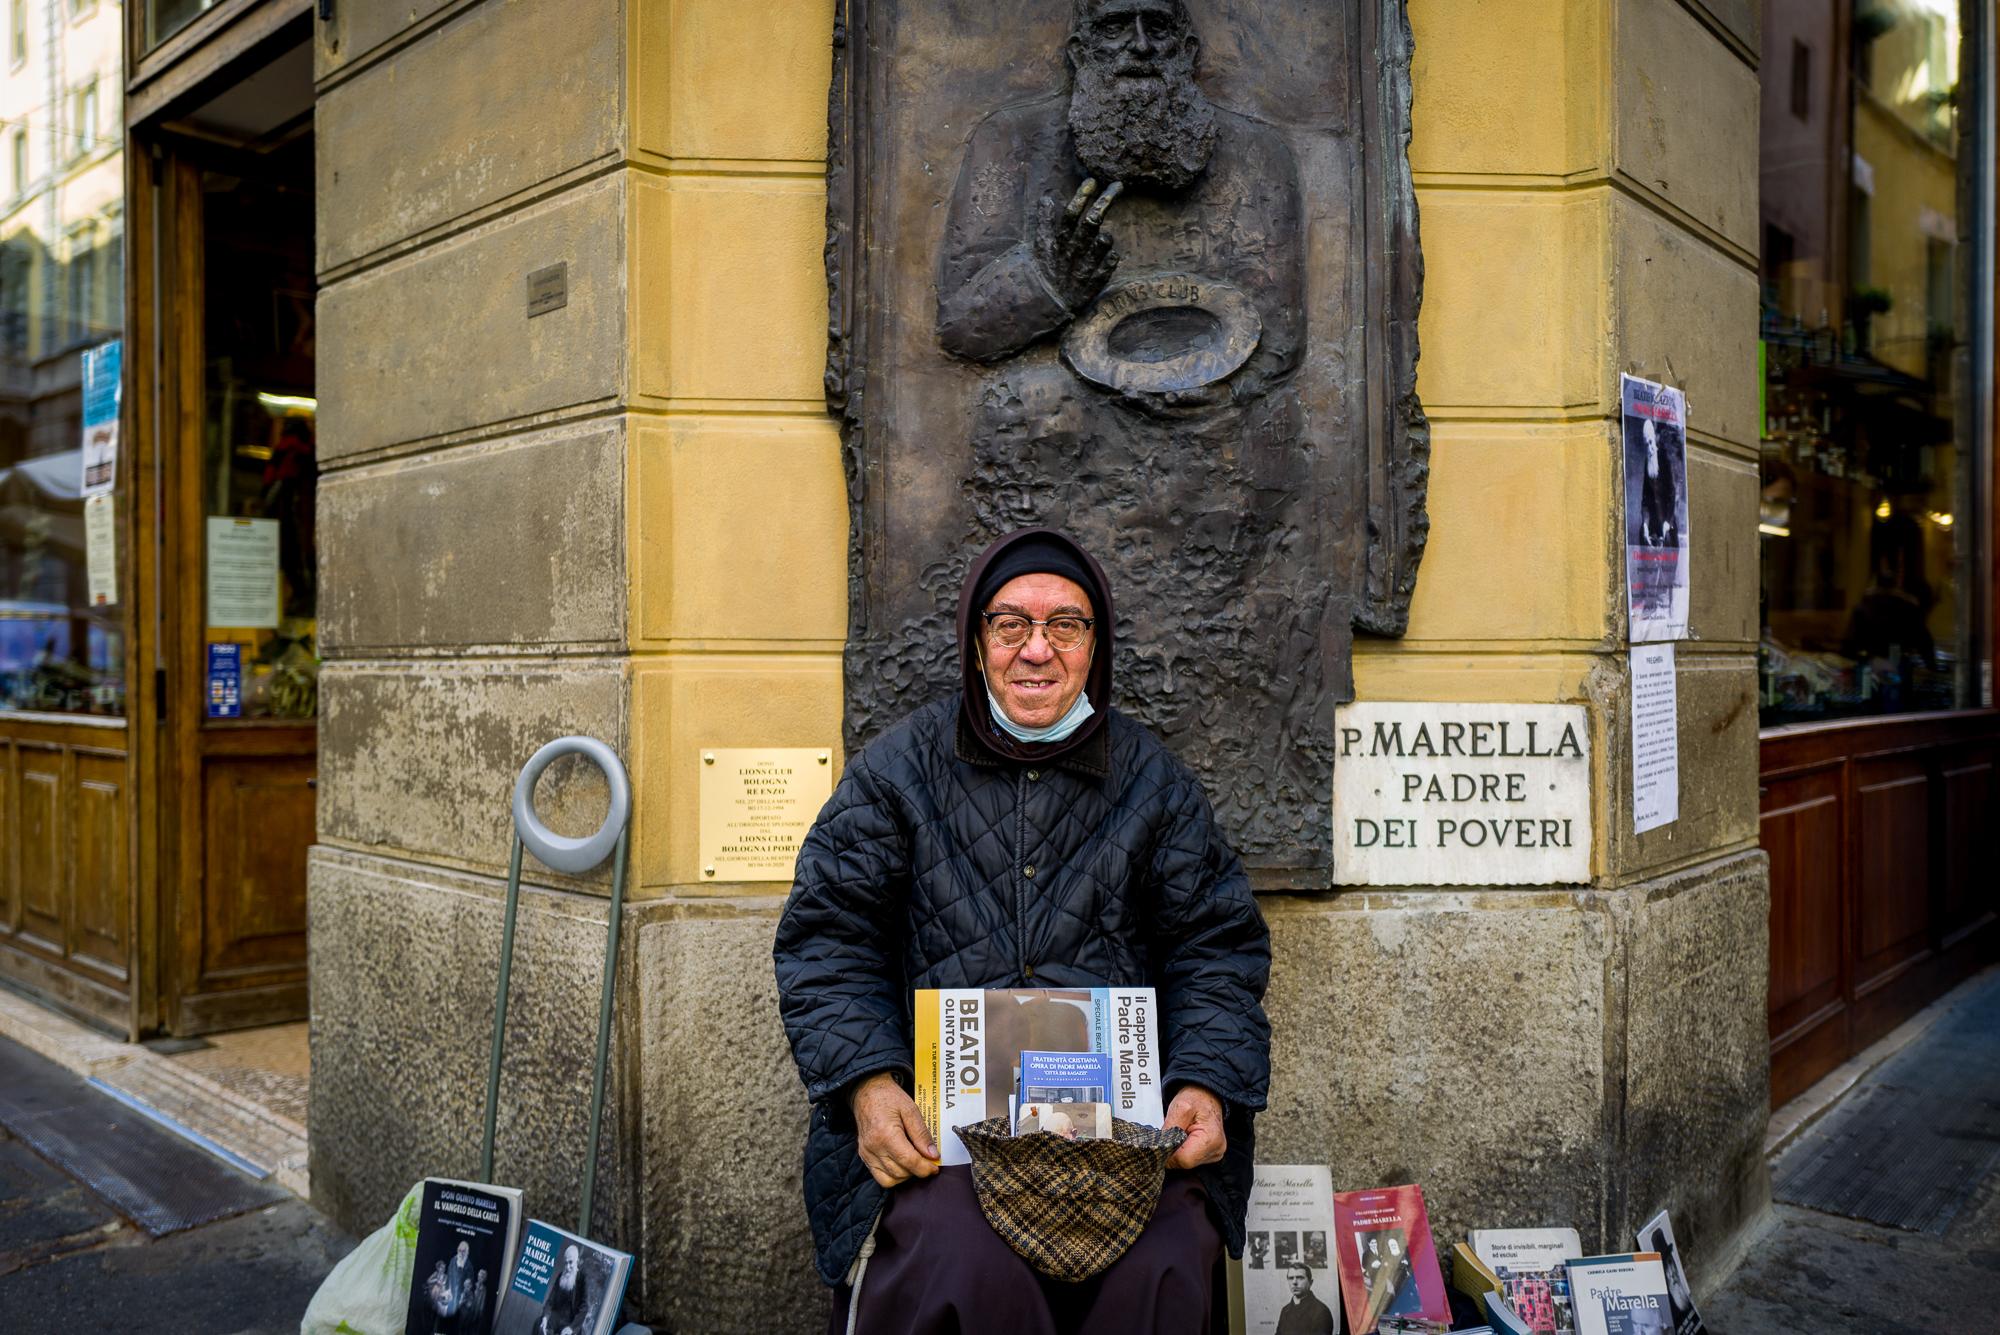 Padre Gabriele angolo Via Pescherie